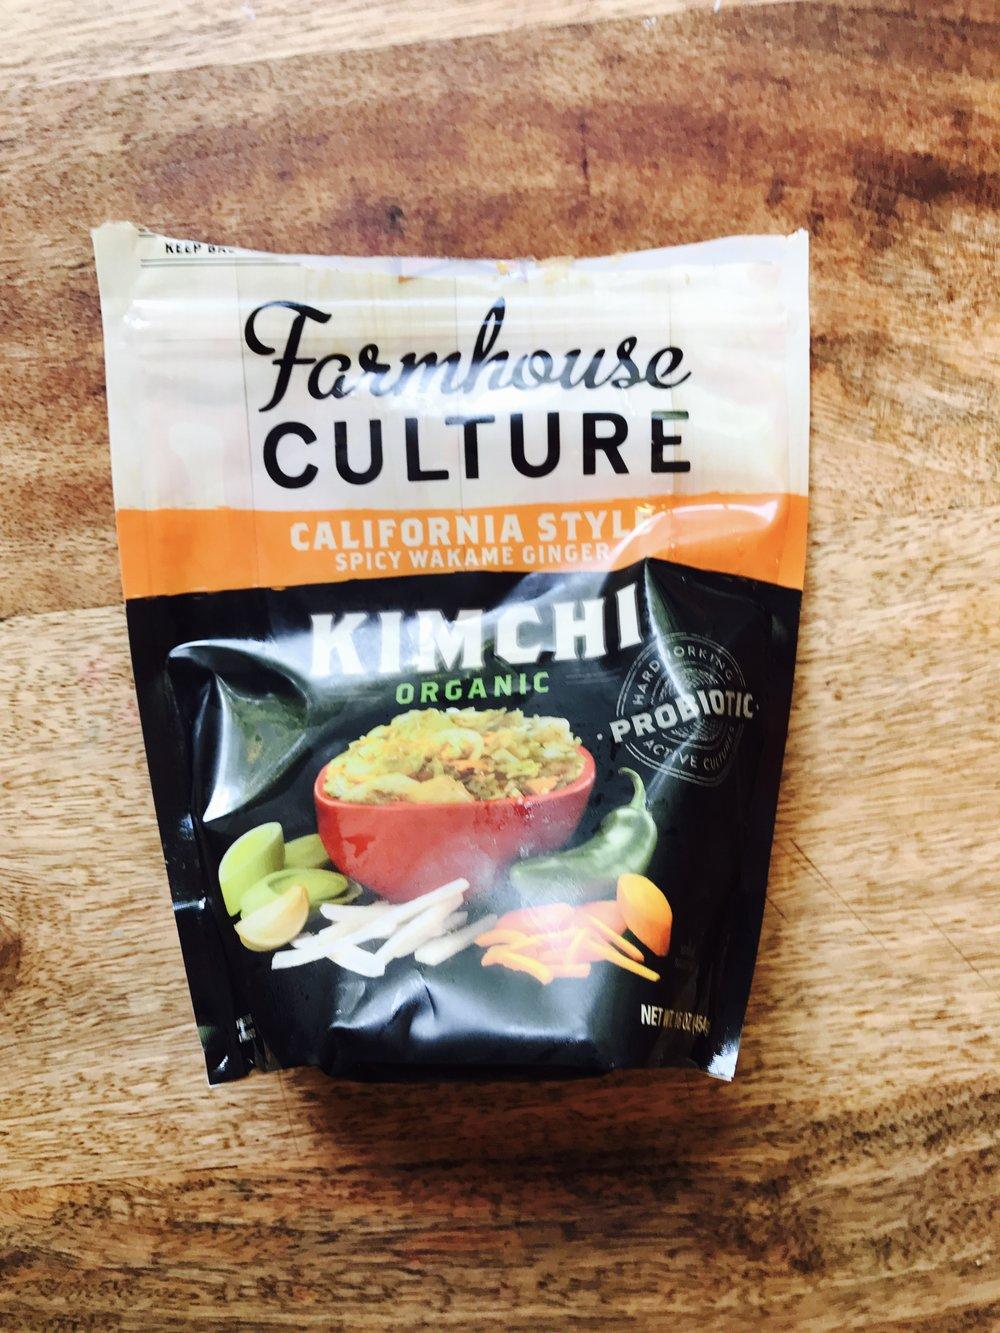 My choice of Kimchee